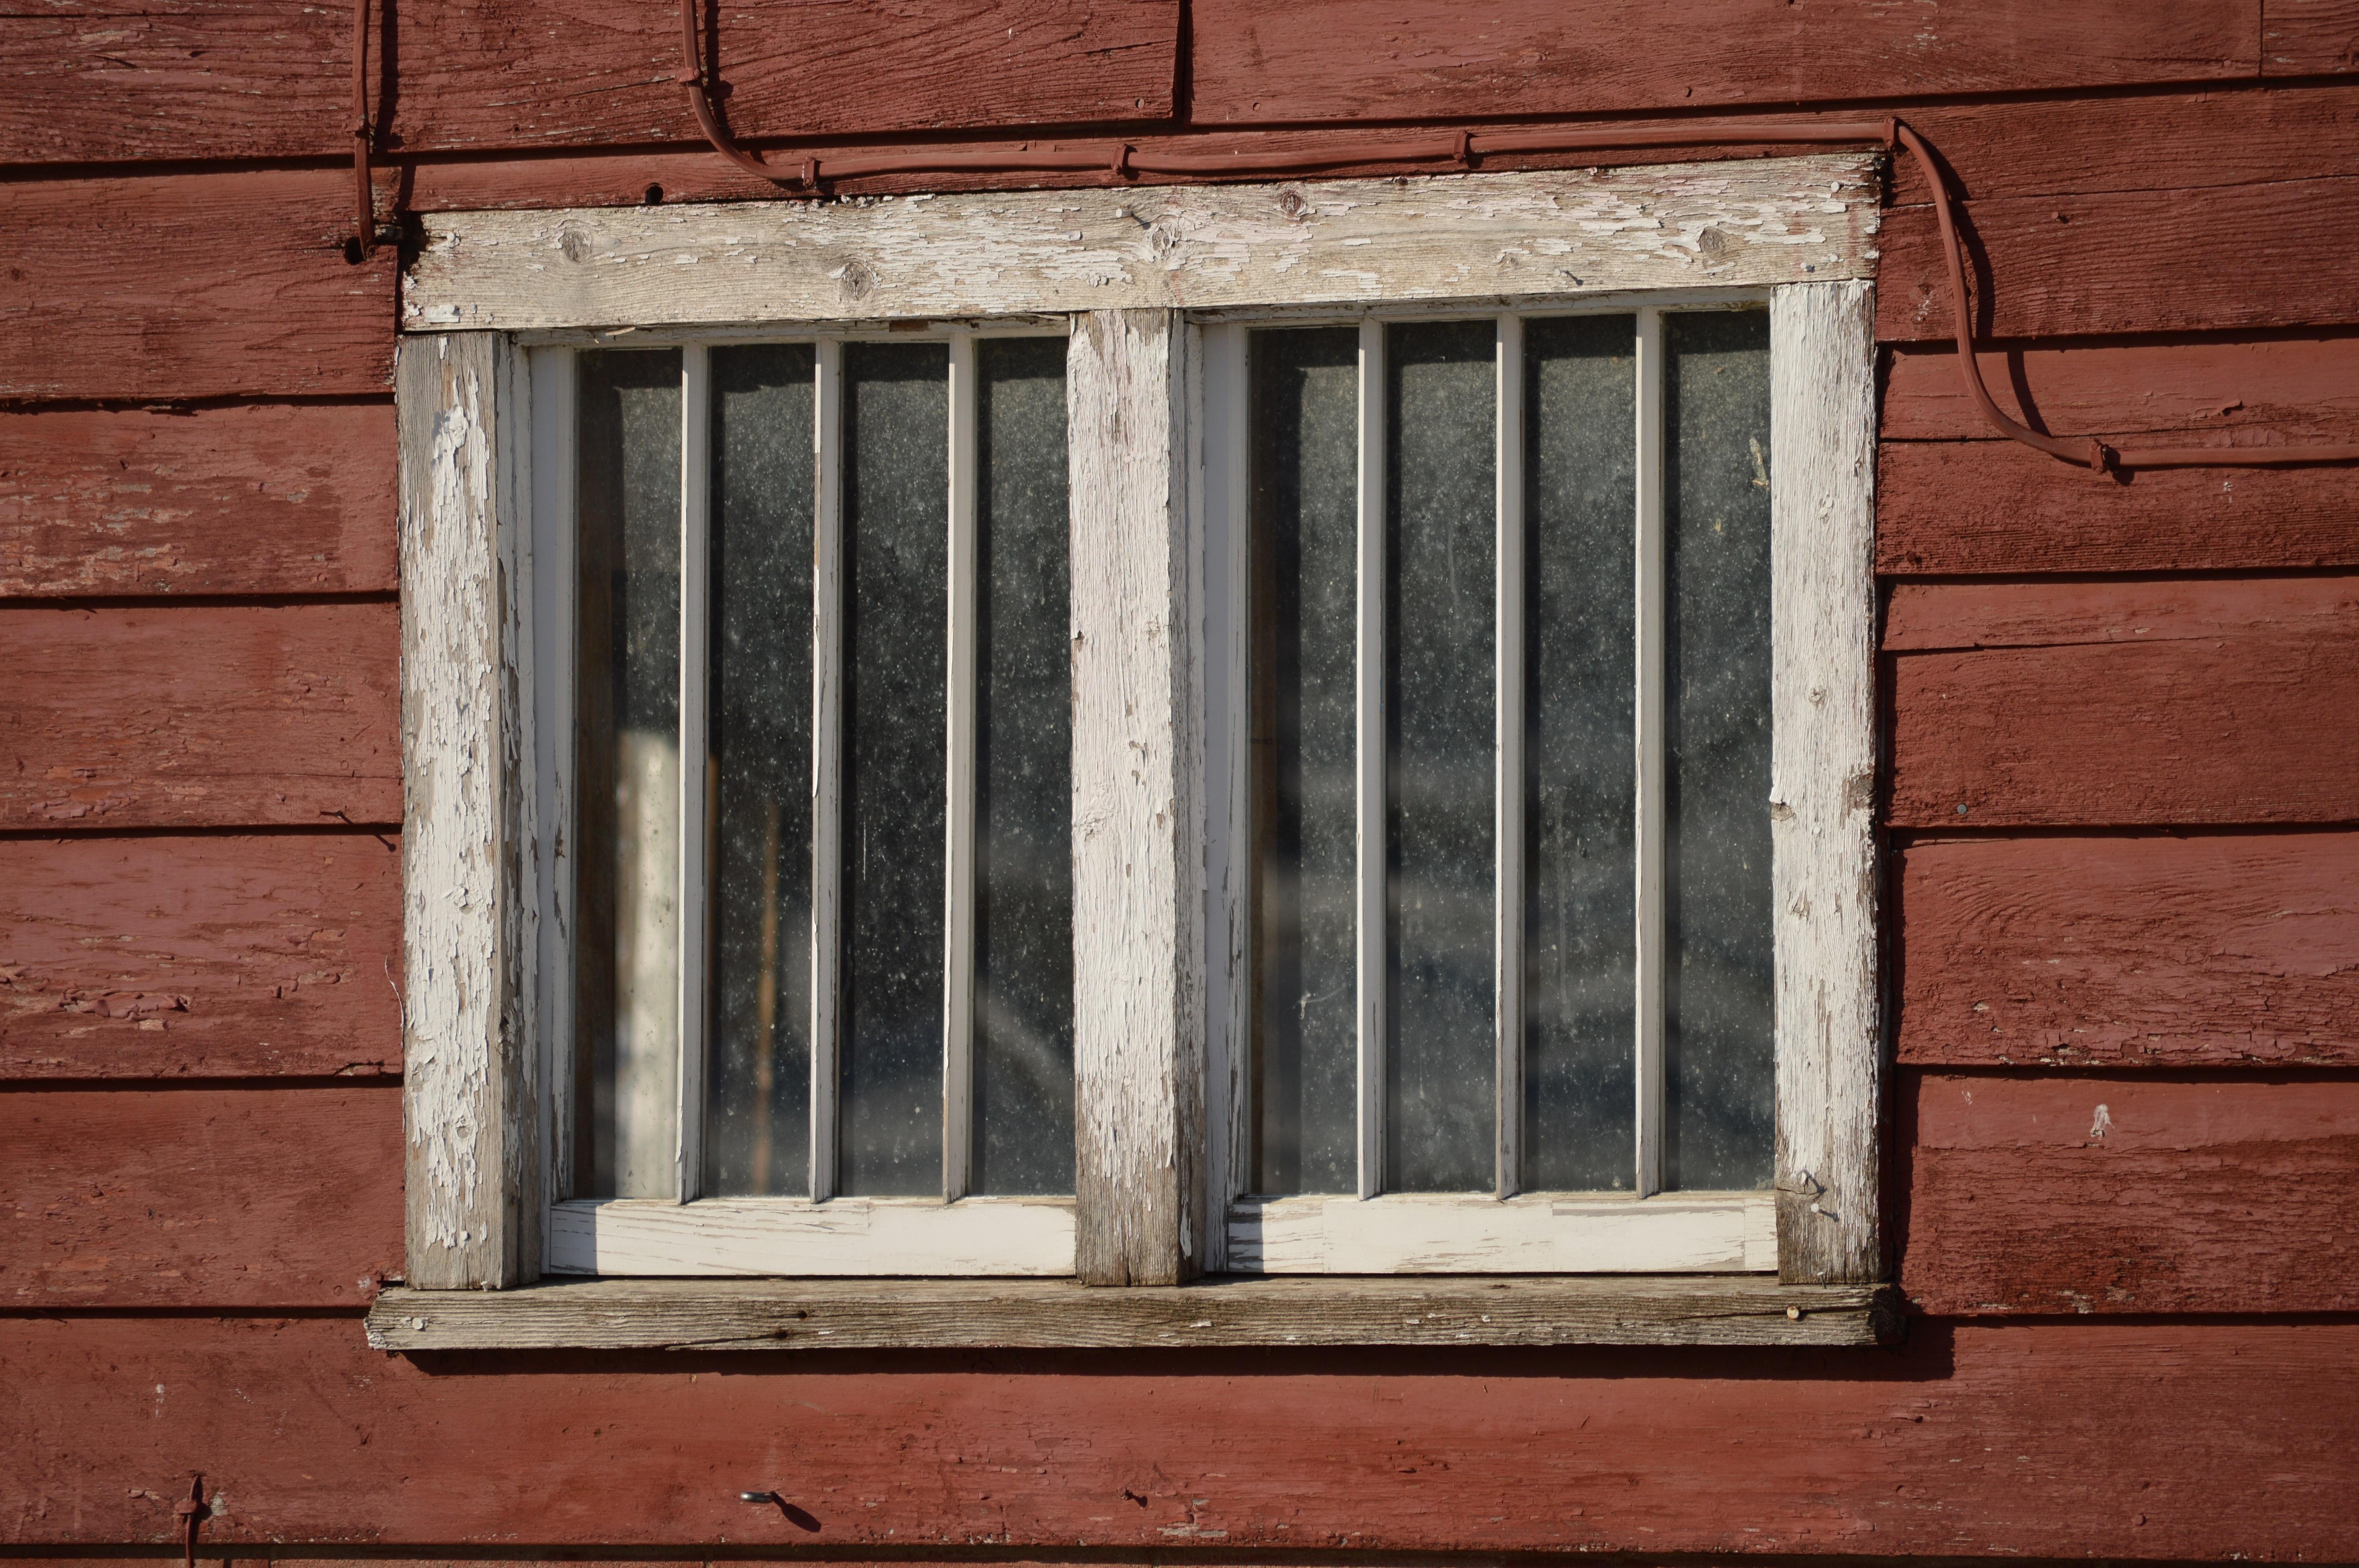 Fotos gratis : arquitectura, madera, casa, textura, granero, pared ...